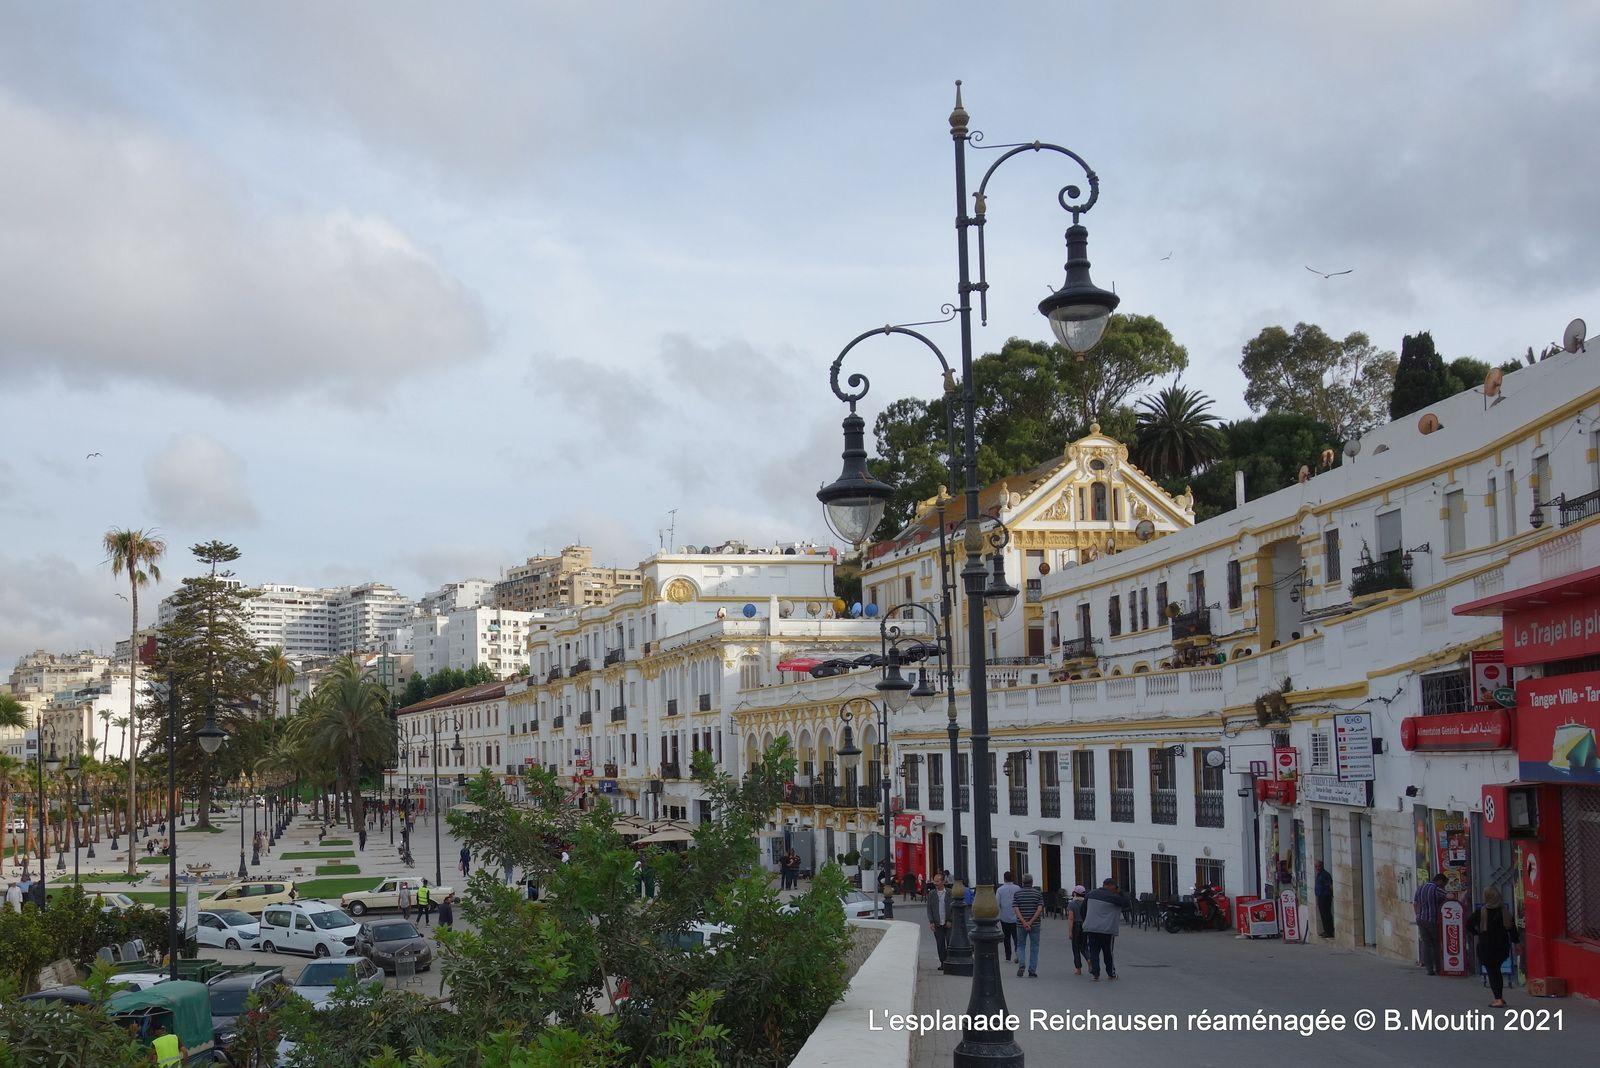 5 photos de l'esplanade Renschhausen réaménagée (Tanger juin 2021)